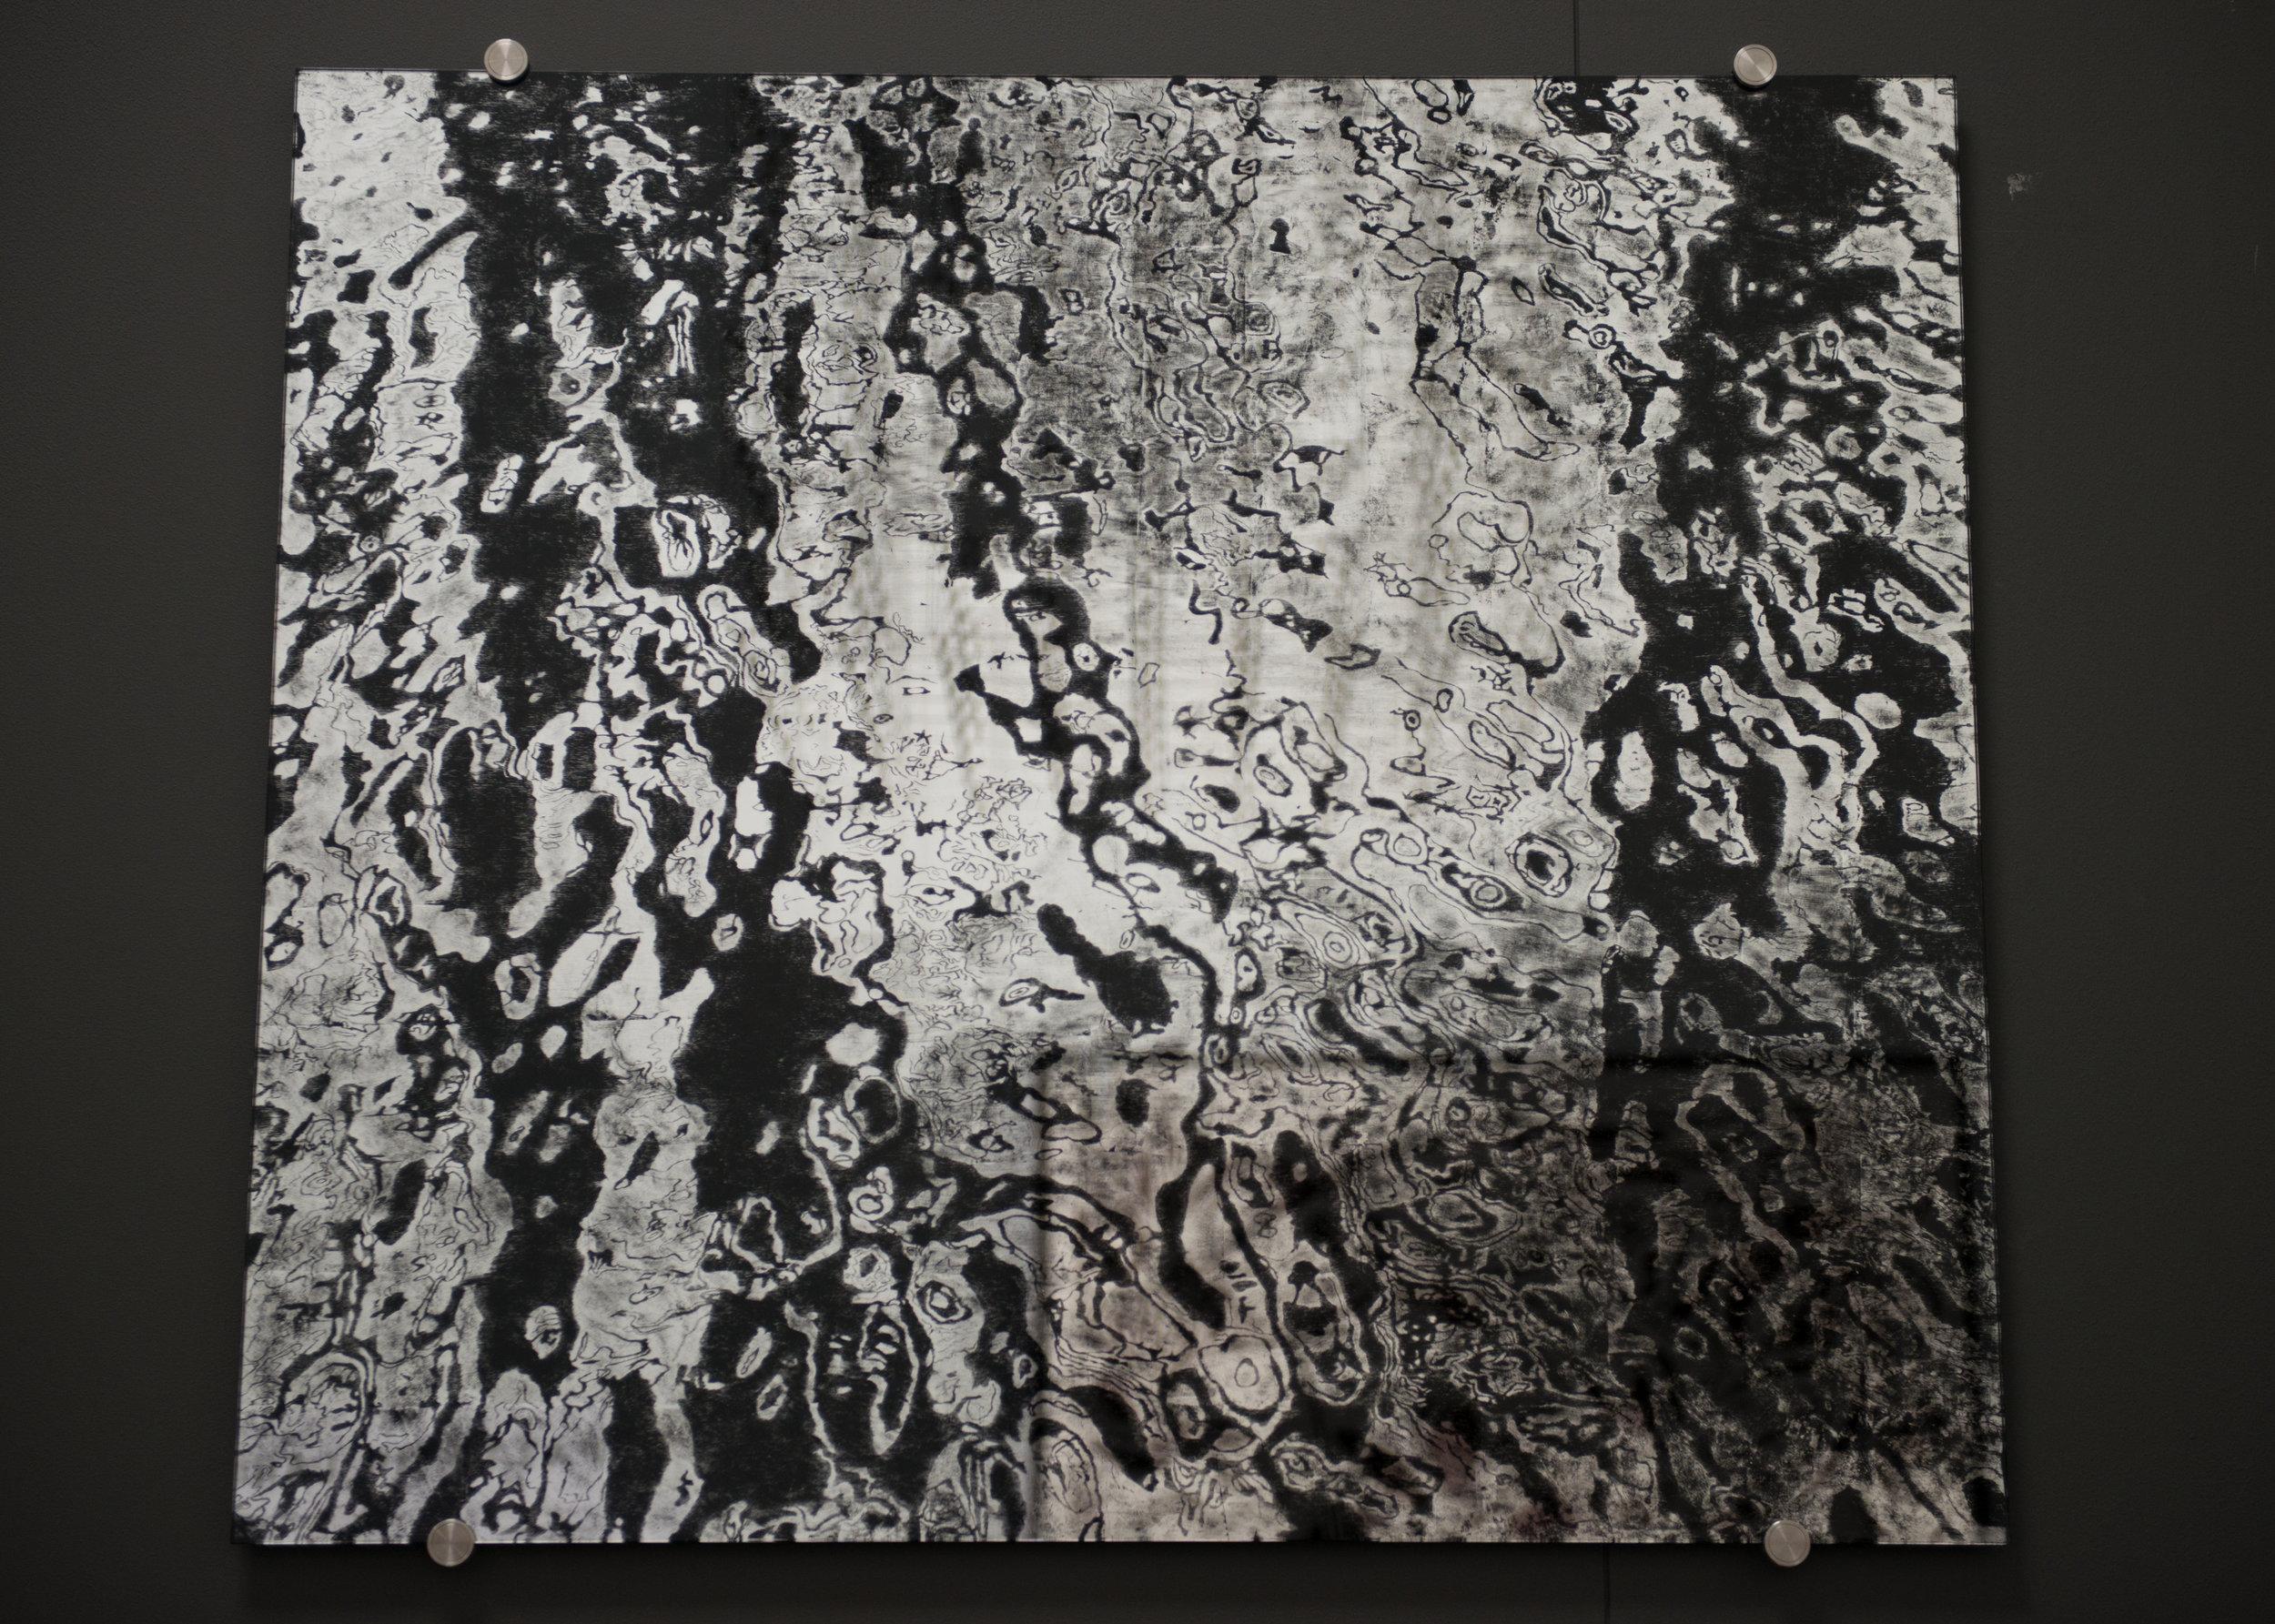 Untitled I: Naga Series